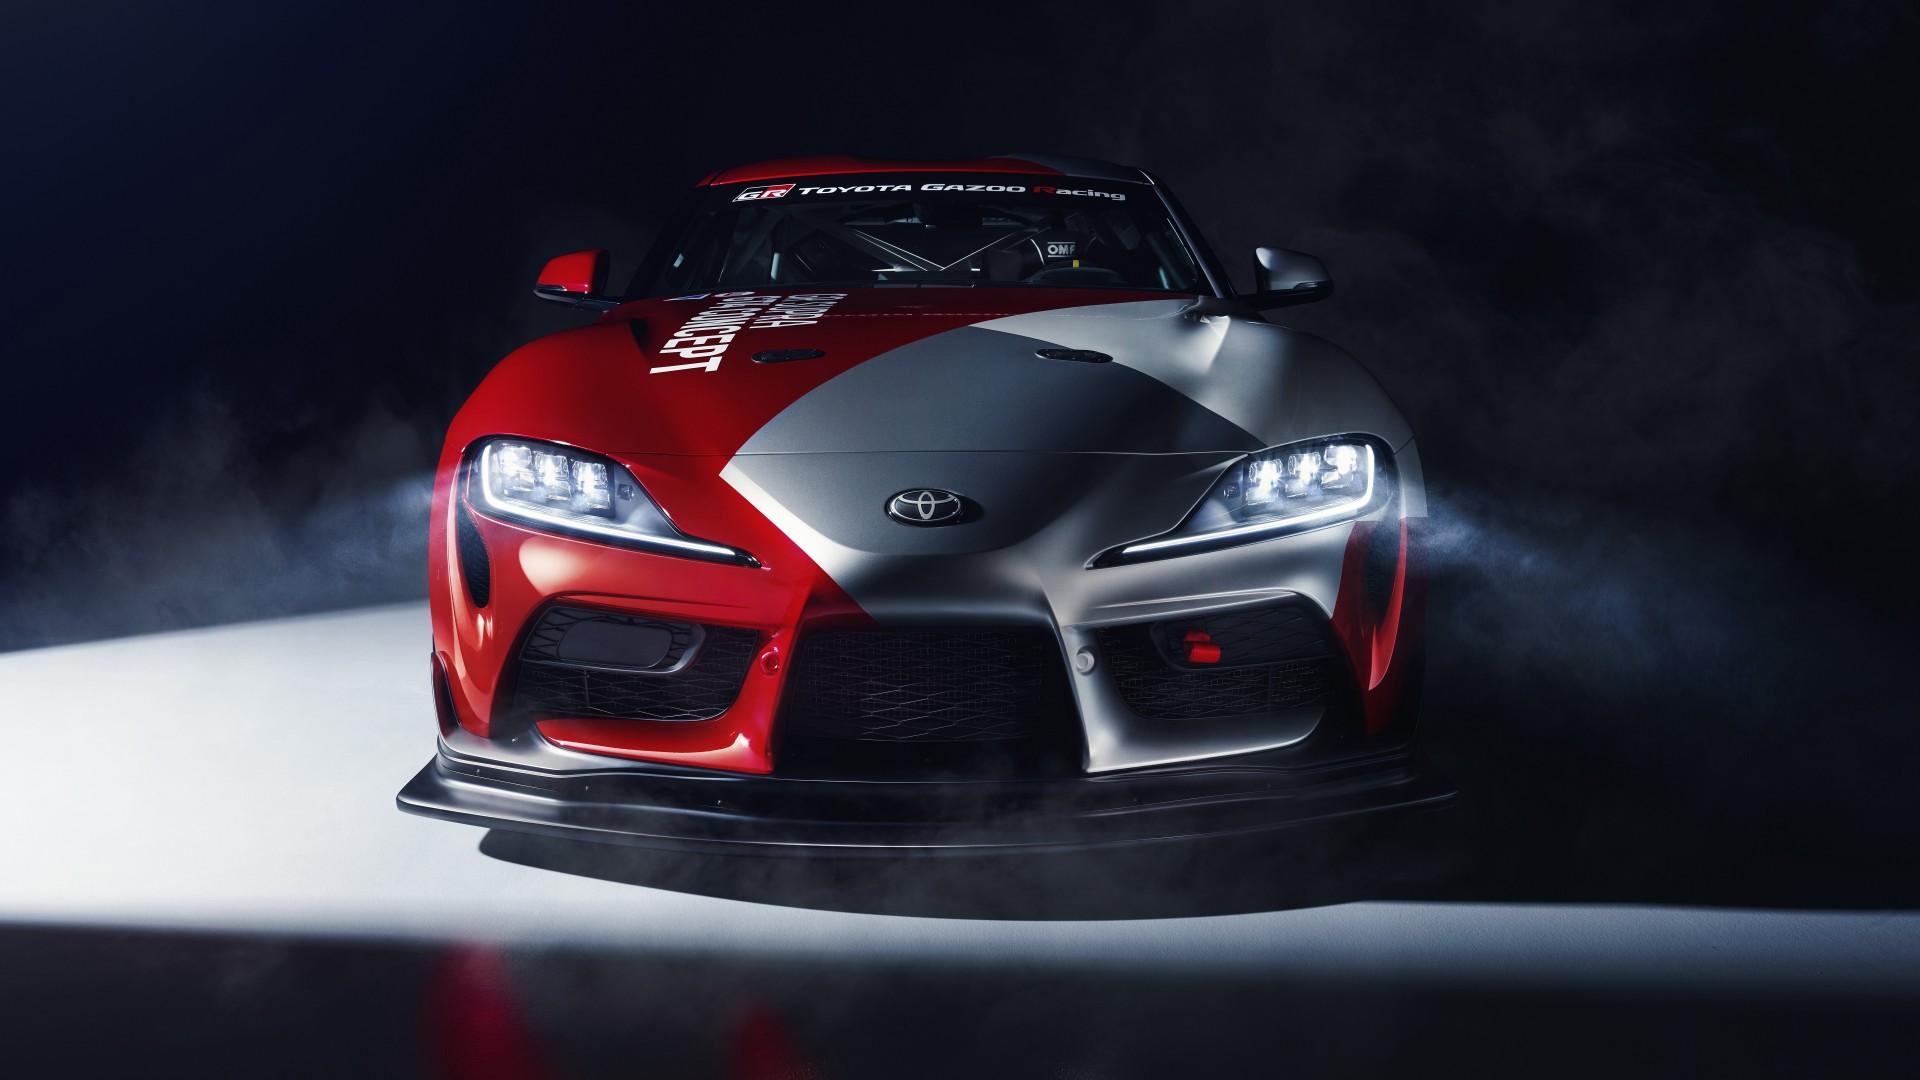 Joker Wallpaper Hd Download Toyota Gr Supra Gt4 Concept 2019 4k 8k Wallpapers Hd